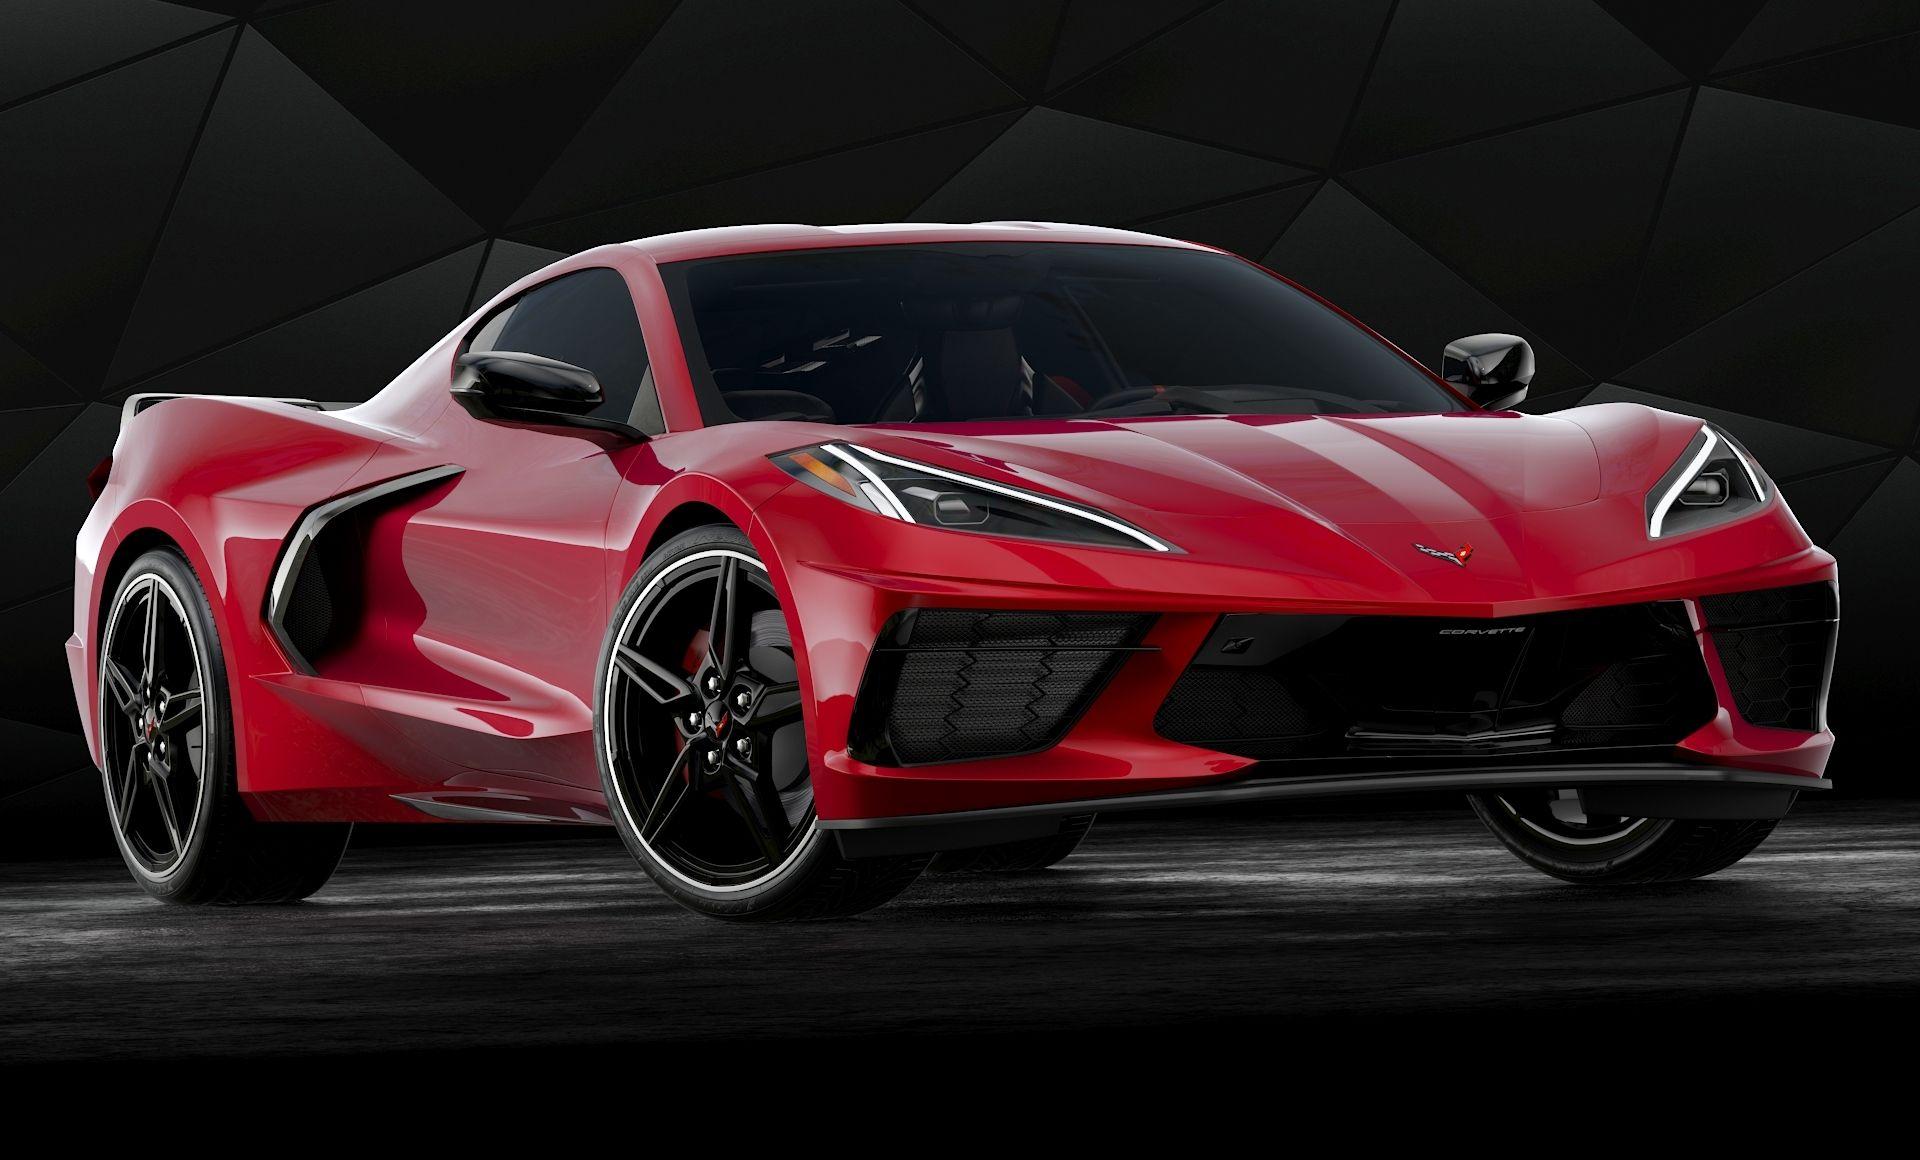 High Detailed 3d Model Of 2020 Chevrolet Corvette C8 Stingray With Interior En 2020 Con Imagenes Autos